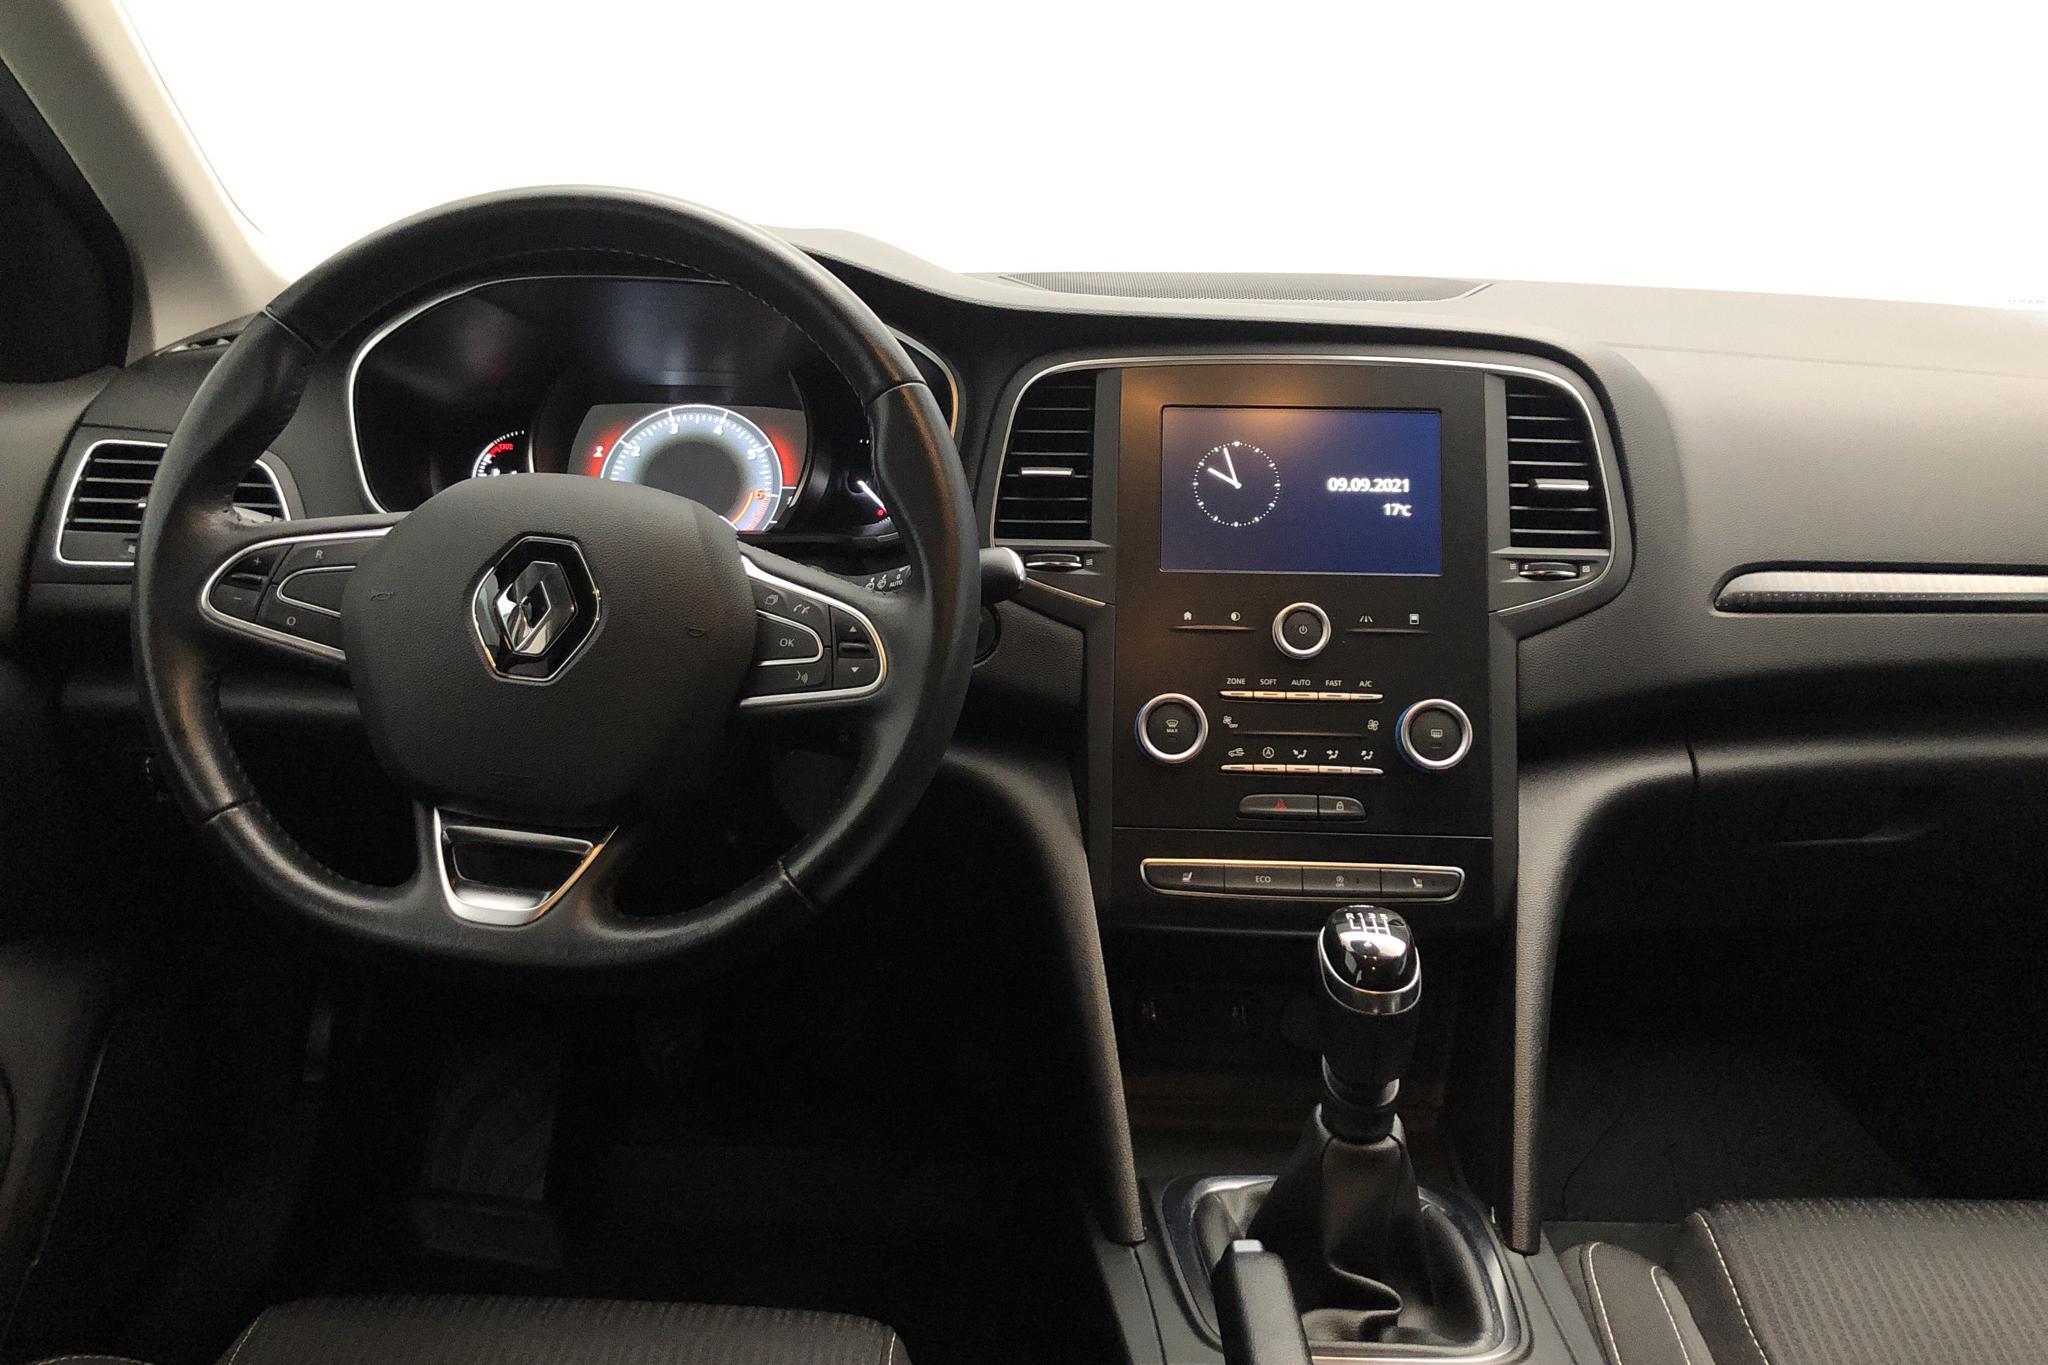 Renault Mégane 1.2 TCe 5dr (130hk) - 7 038 mil - Manuell - 2017